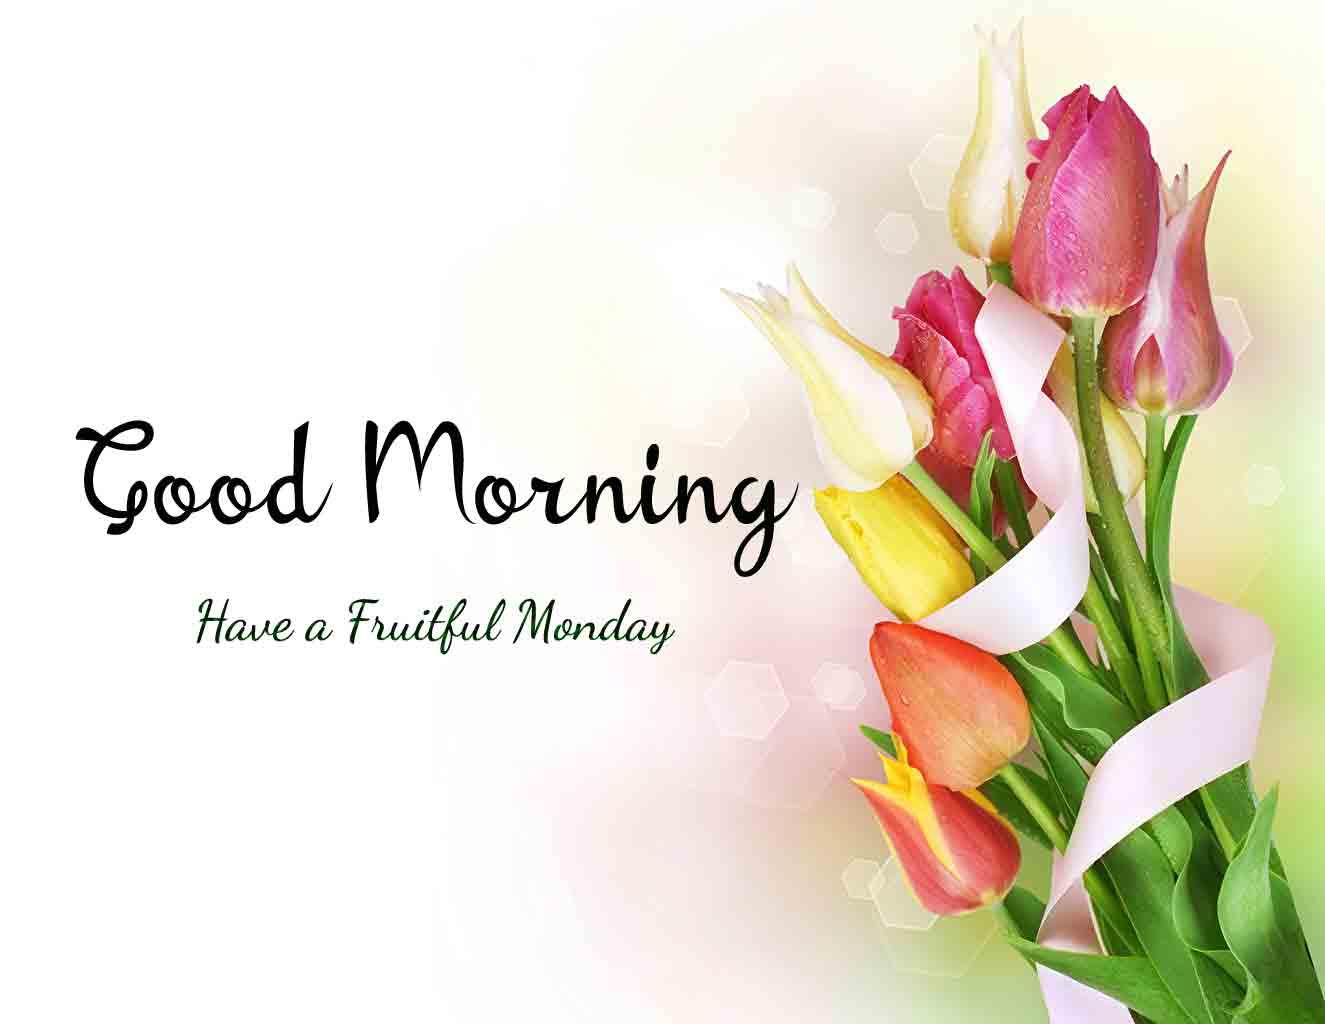 Monday Good Morning Images pics wallpaper hd